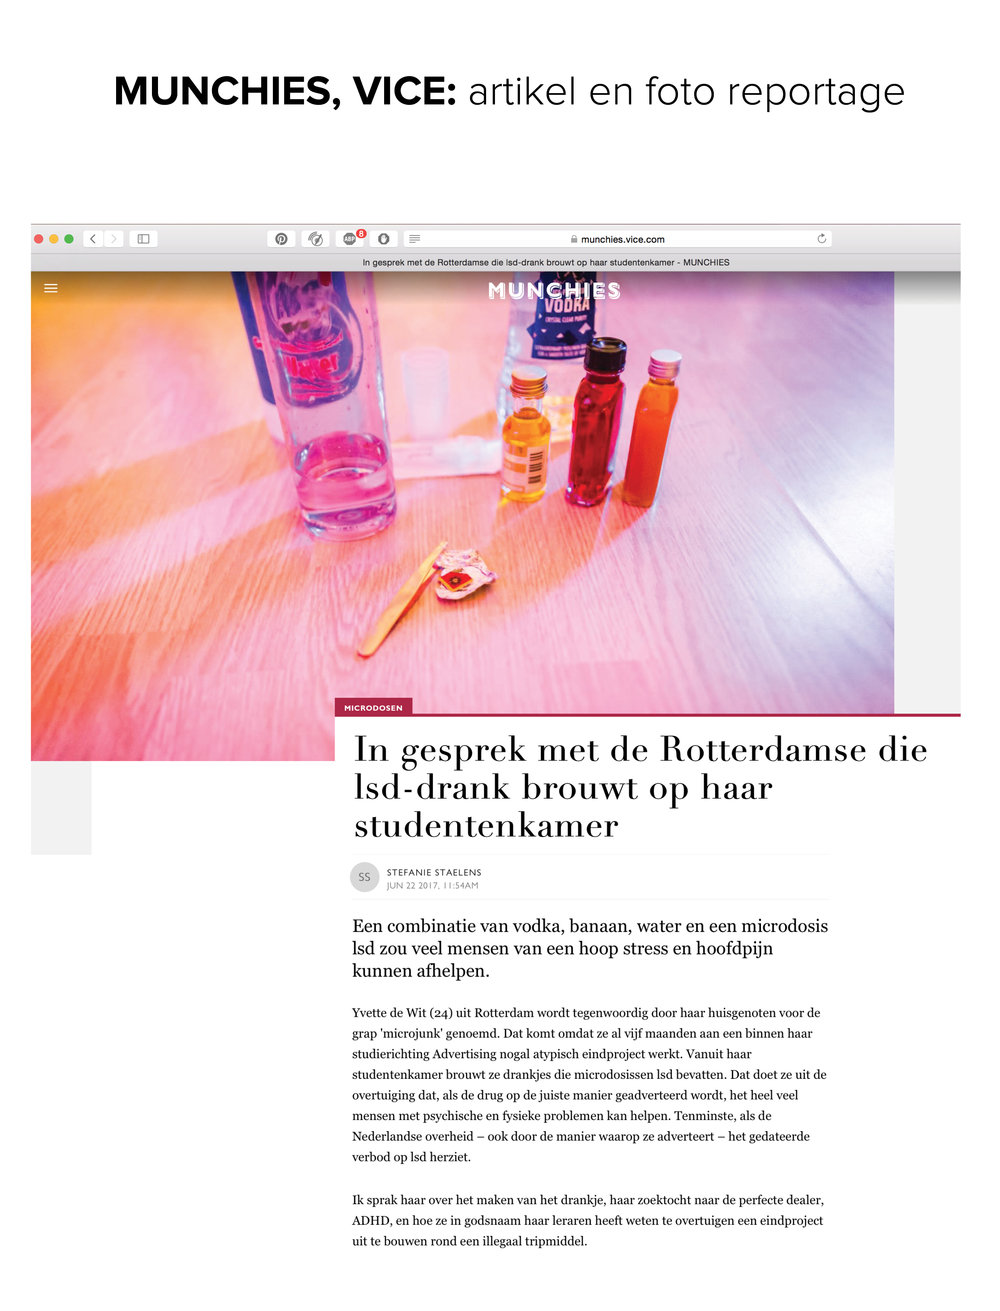 Interview  VICE Munchies    https://munchies.vice.com/nl/article/newpzg/in-gesprek-met-de-rotterdamse-studente-die-lsd-drank-brouwt